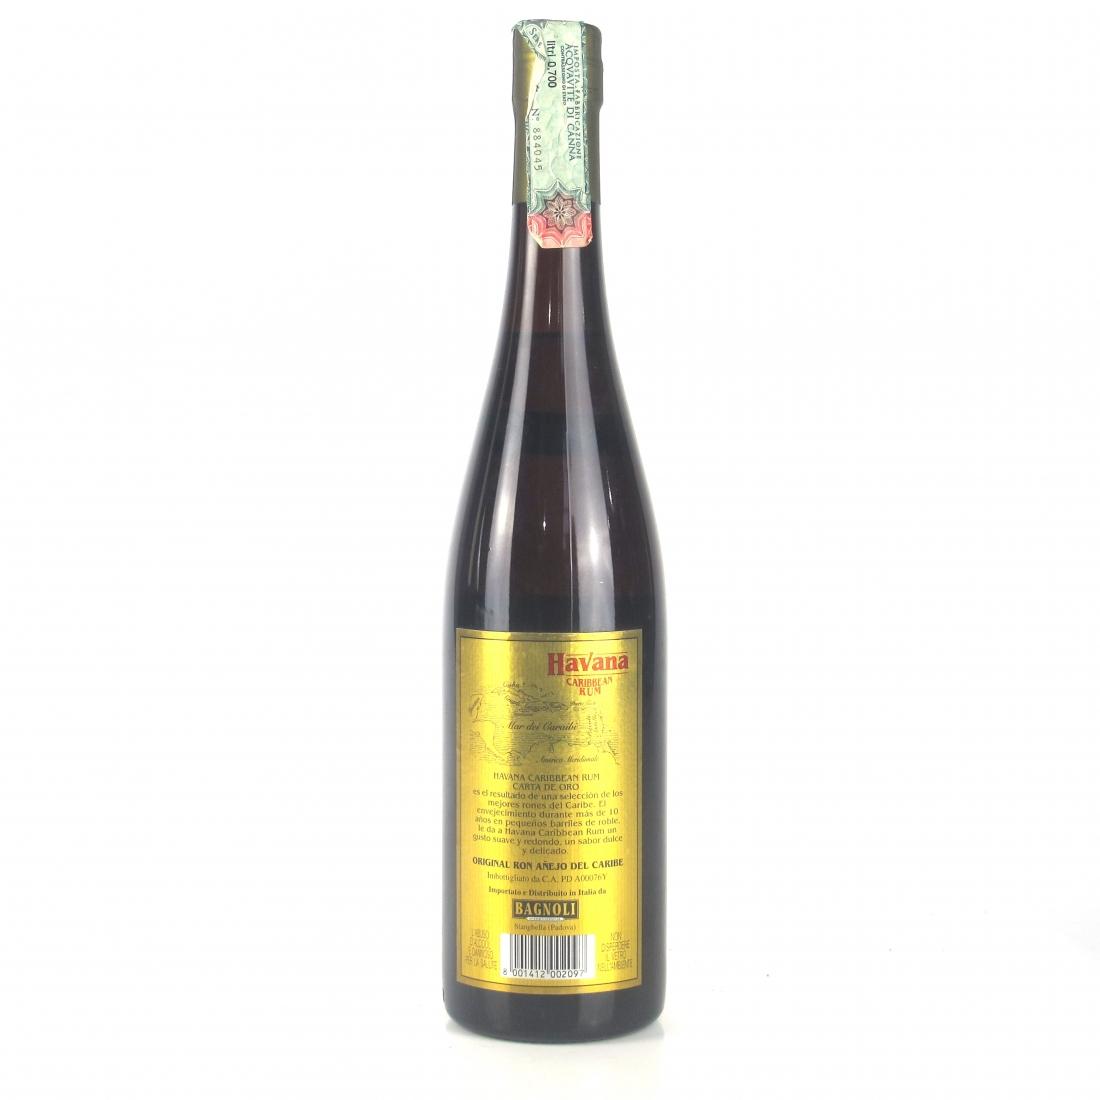 Havana 10 Year Old Caribbean Rum / Italian Import